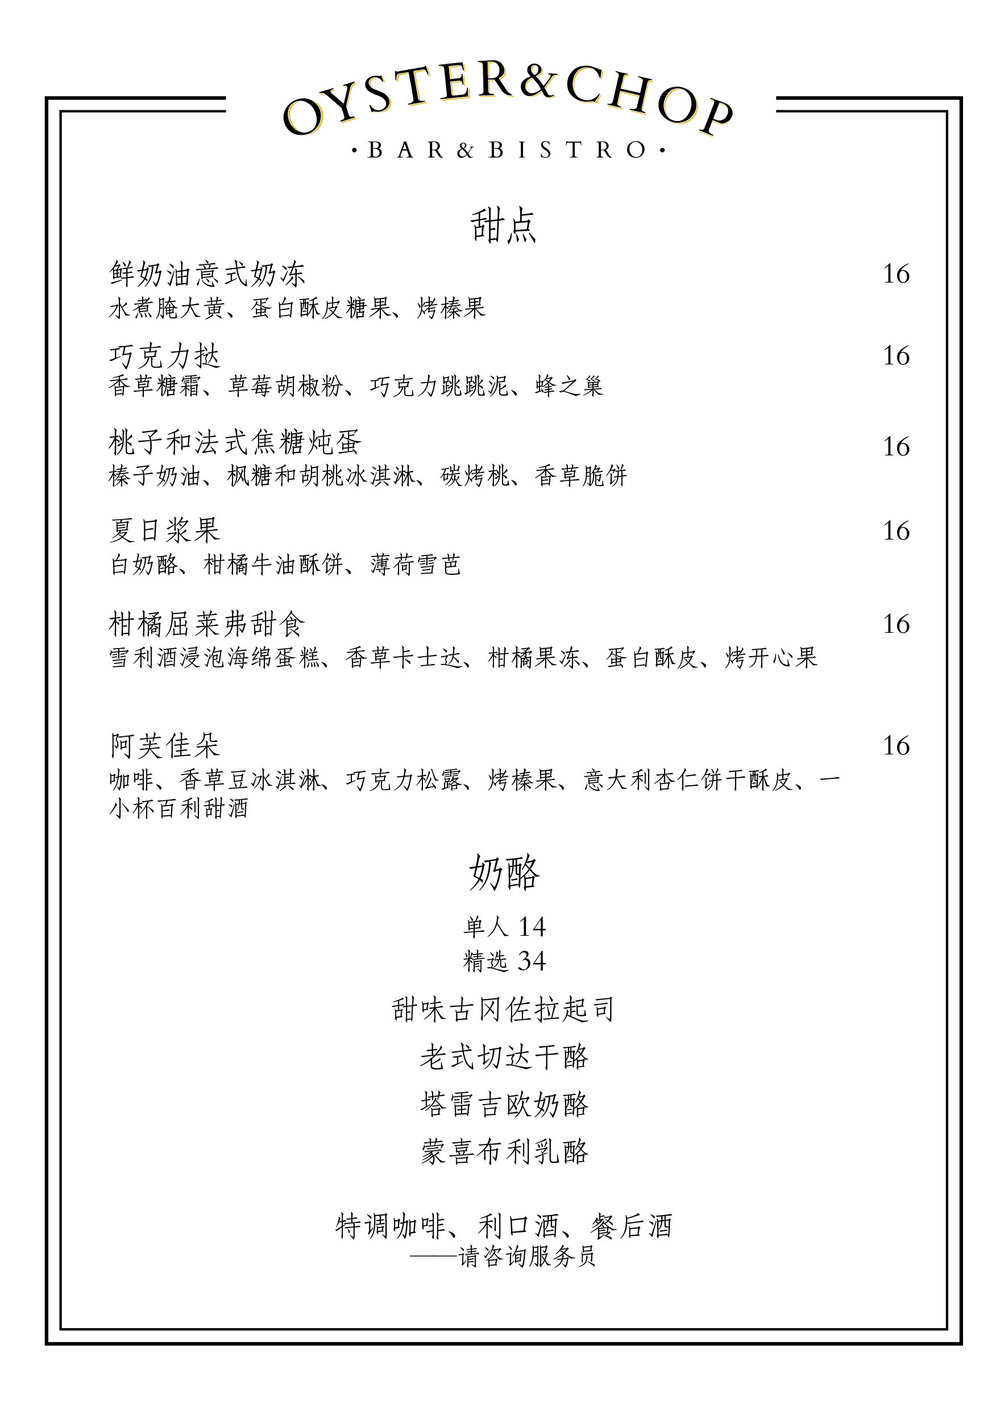 OC dessert - chinese.jpg